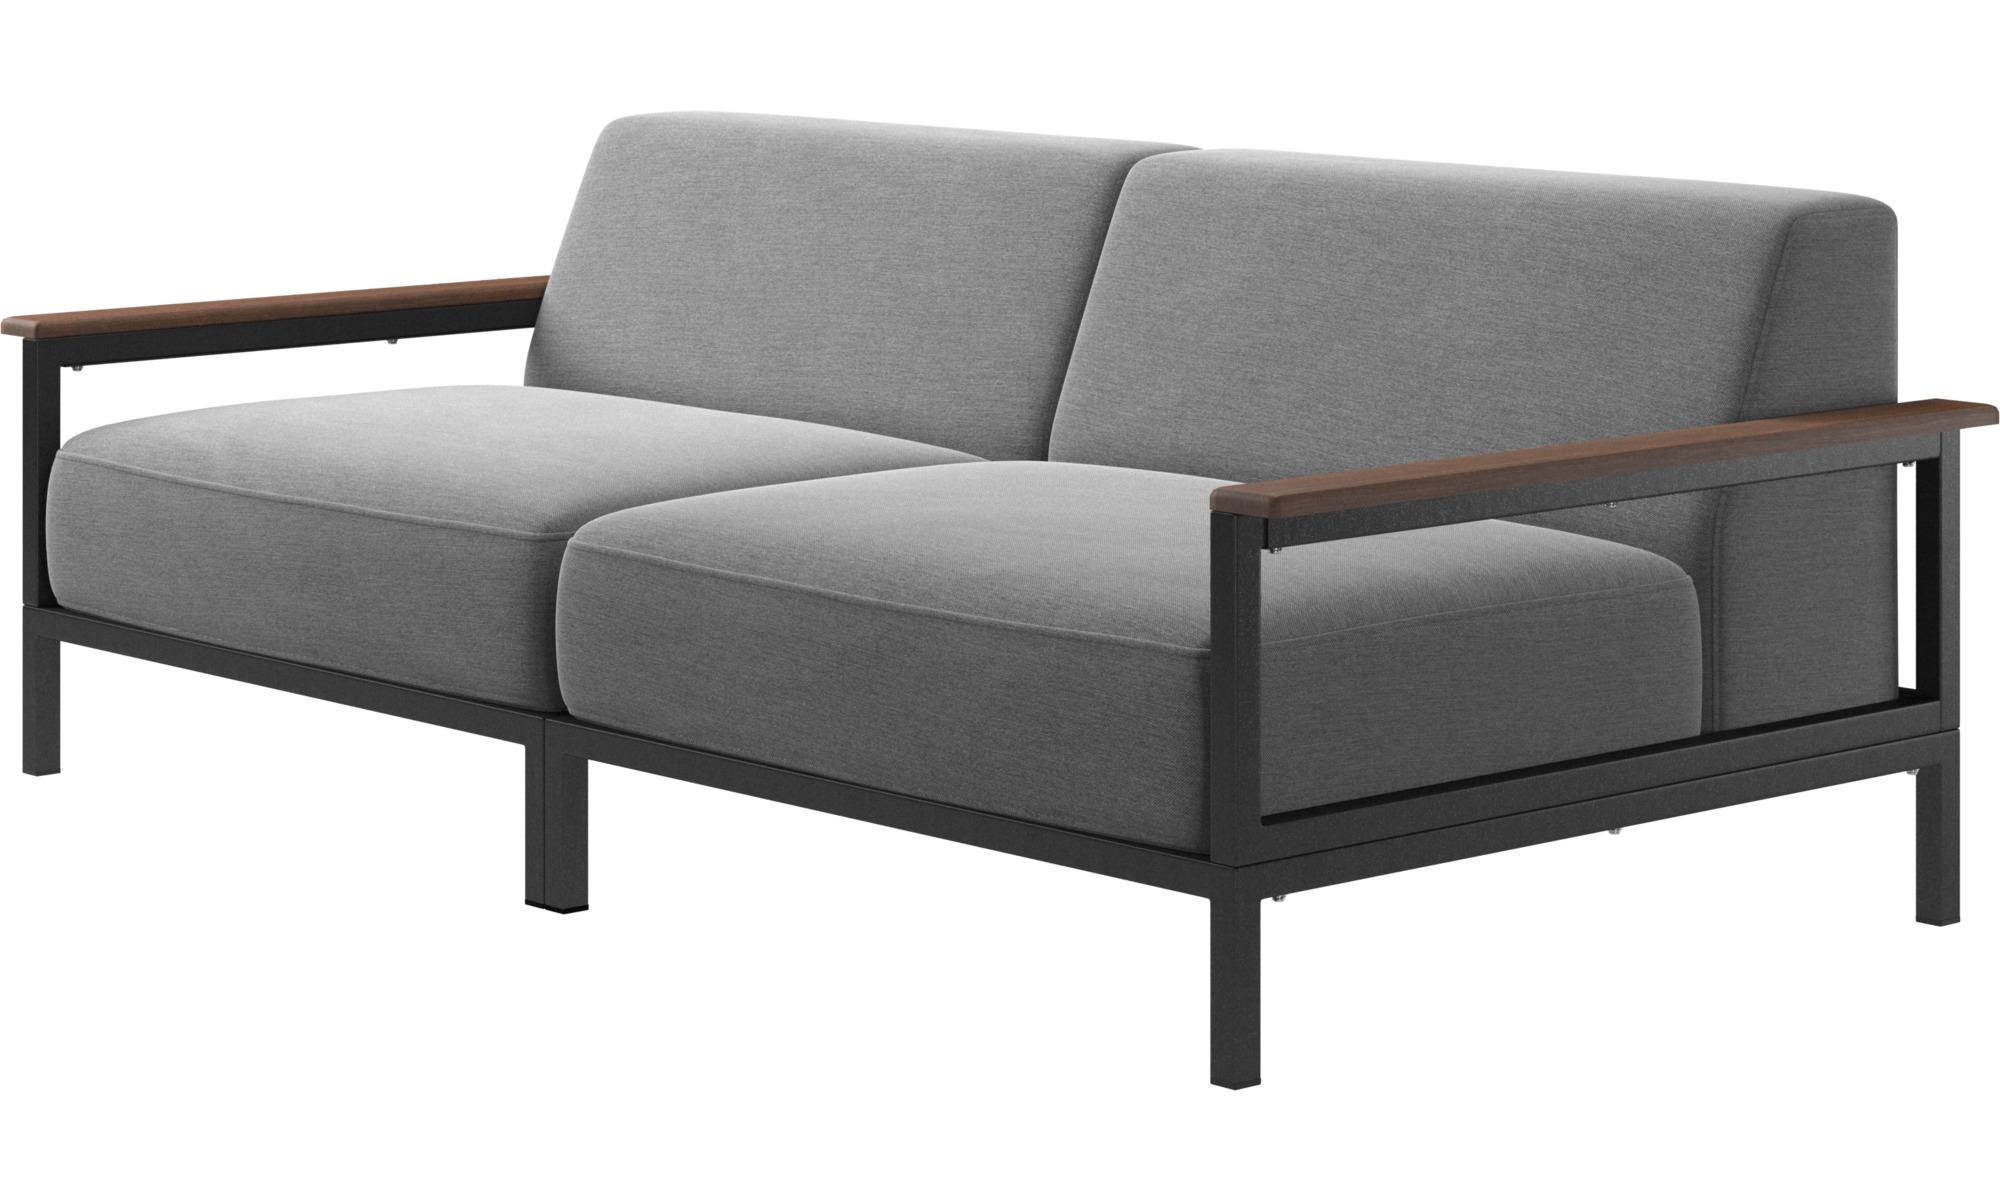 Outdoor Sofas Rome Sofa